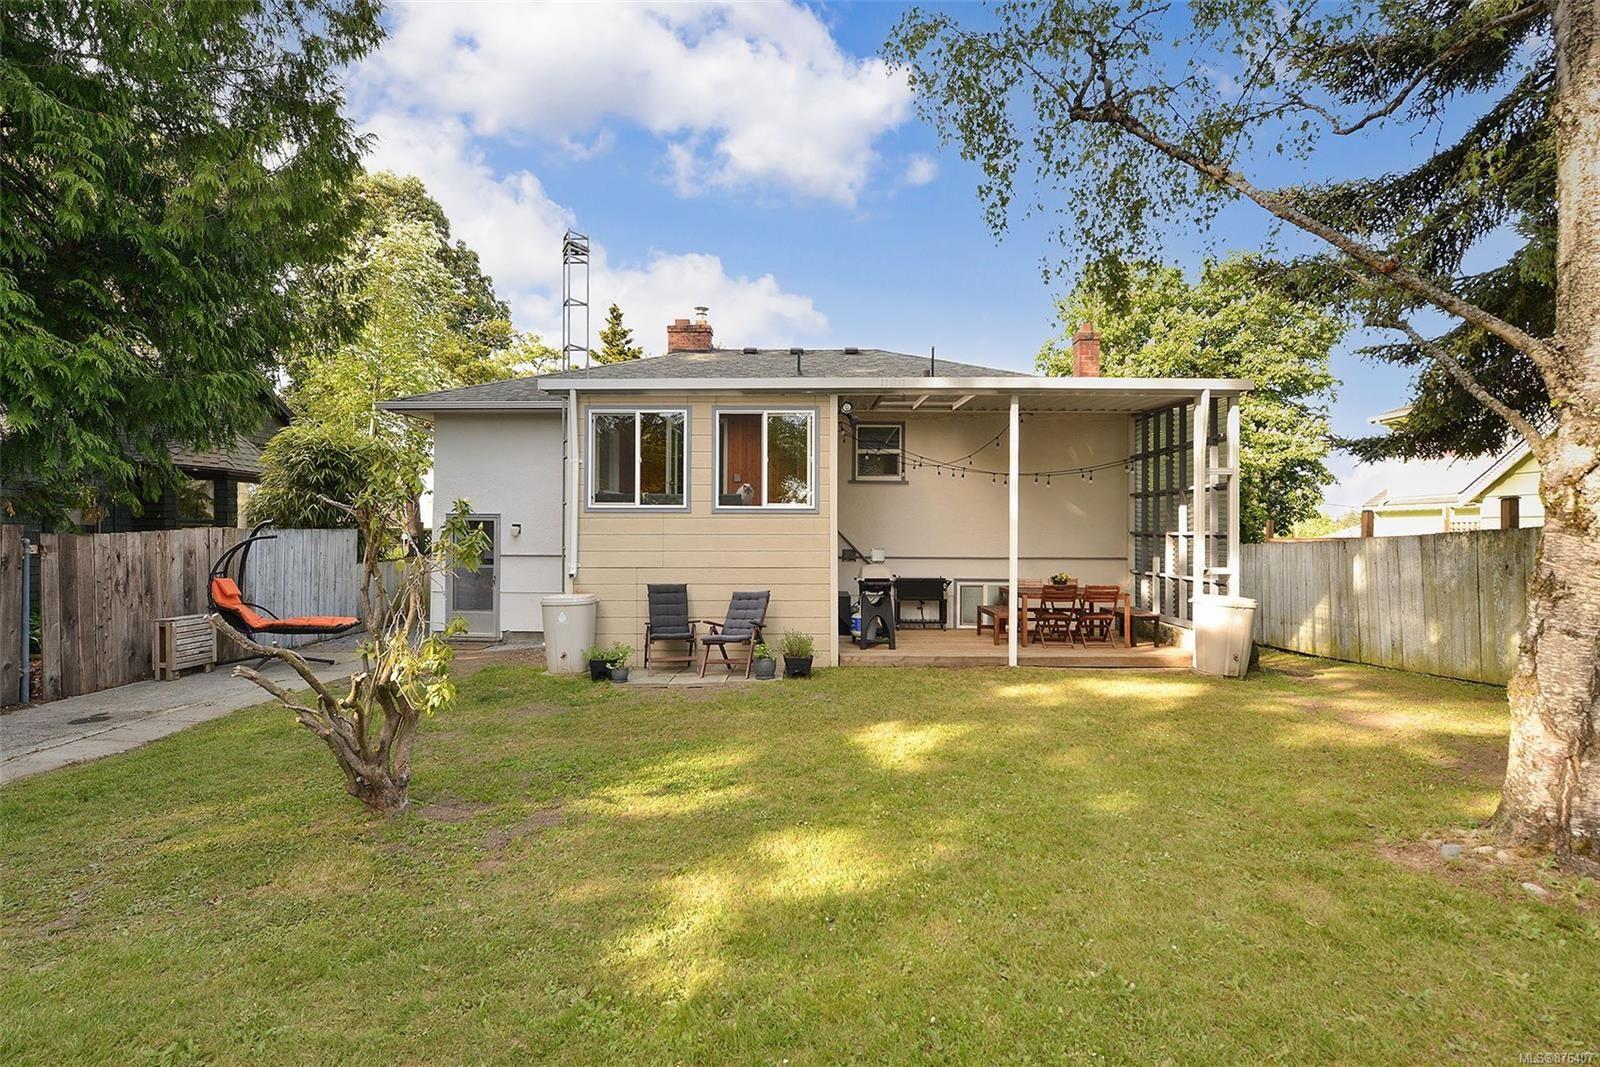 Photo 11: Photos: 631 Cowper St in Saanich: SW Gorge House for sale (Saanich West)  : MLS®# 876407